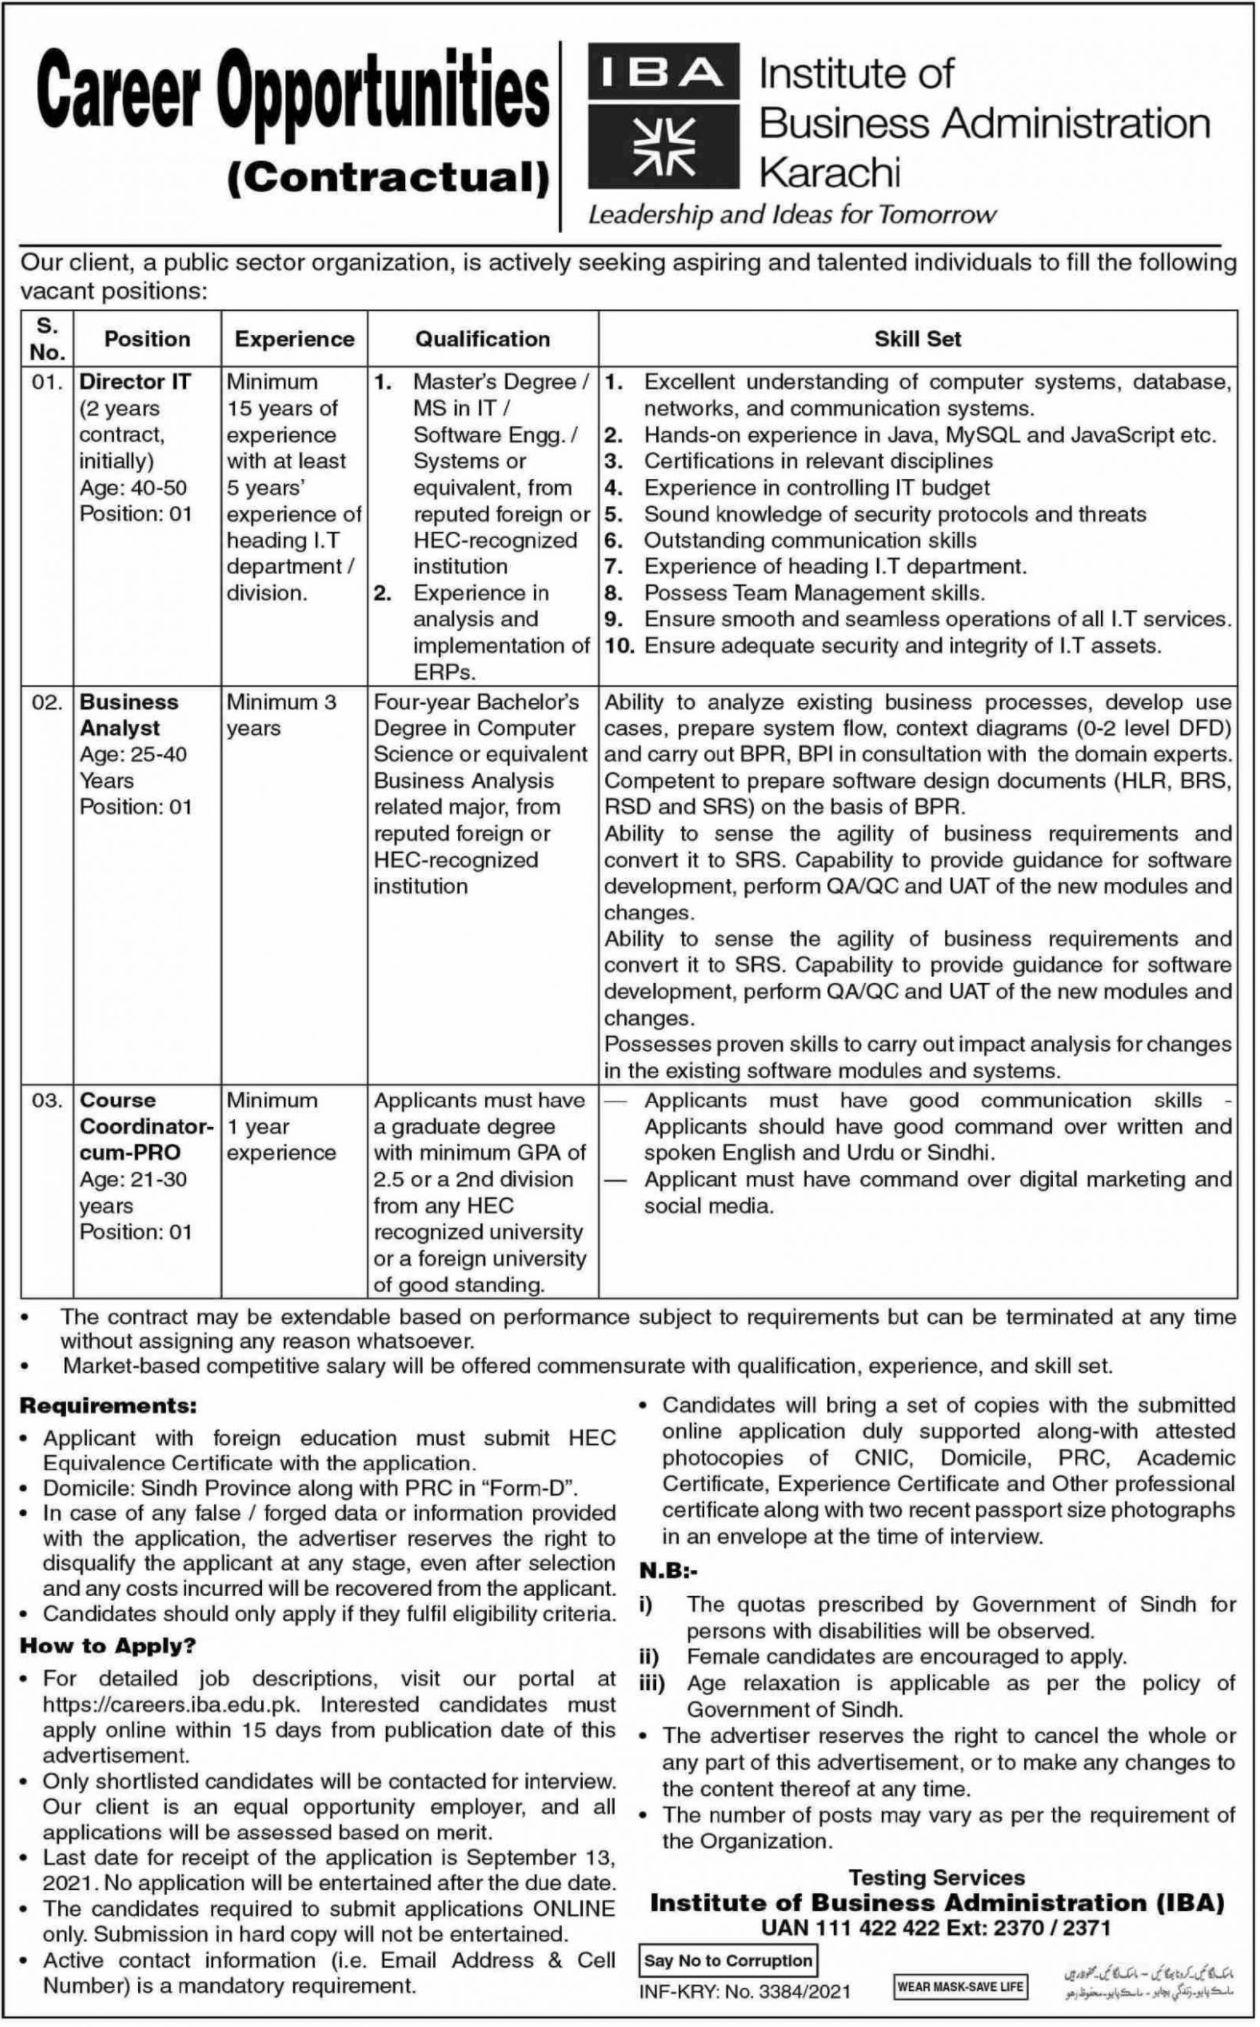 Institute of Business Administration Karachi Vacancies 2021 3